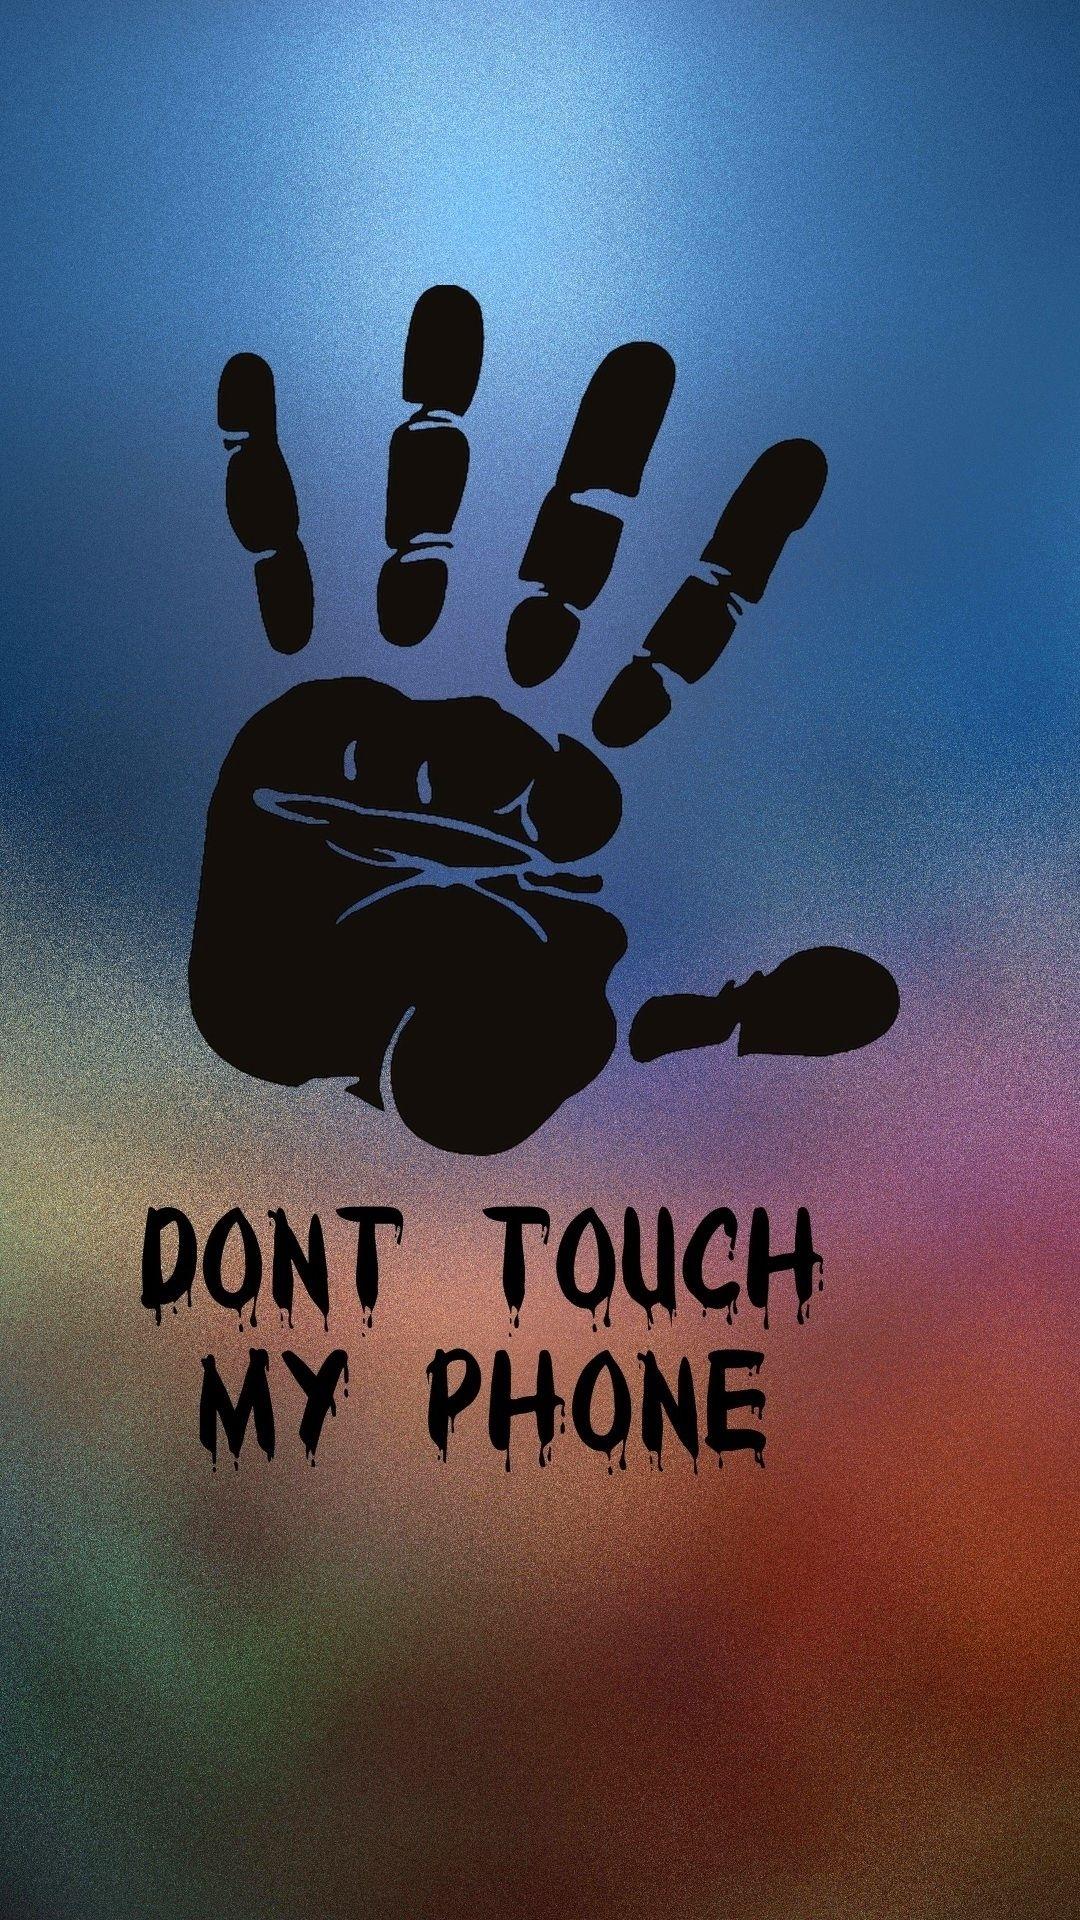 dont touch my phone apple iphone 5s hd Обои доступны для бесплатного